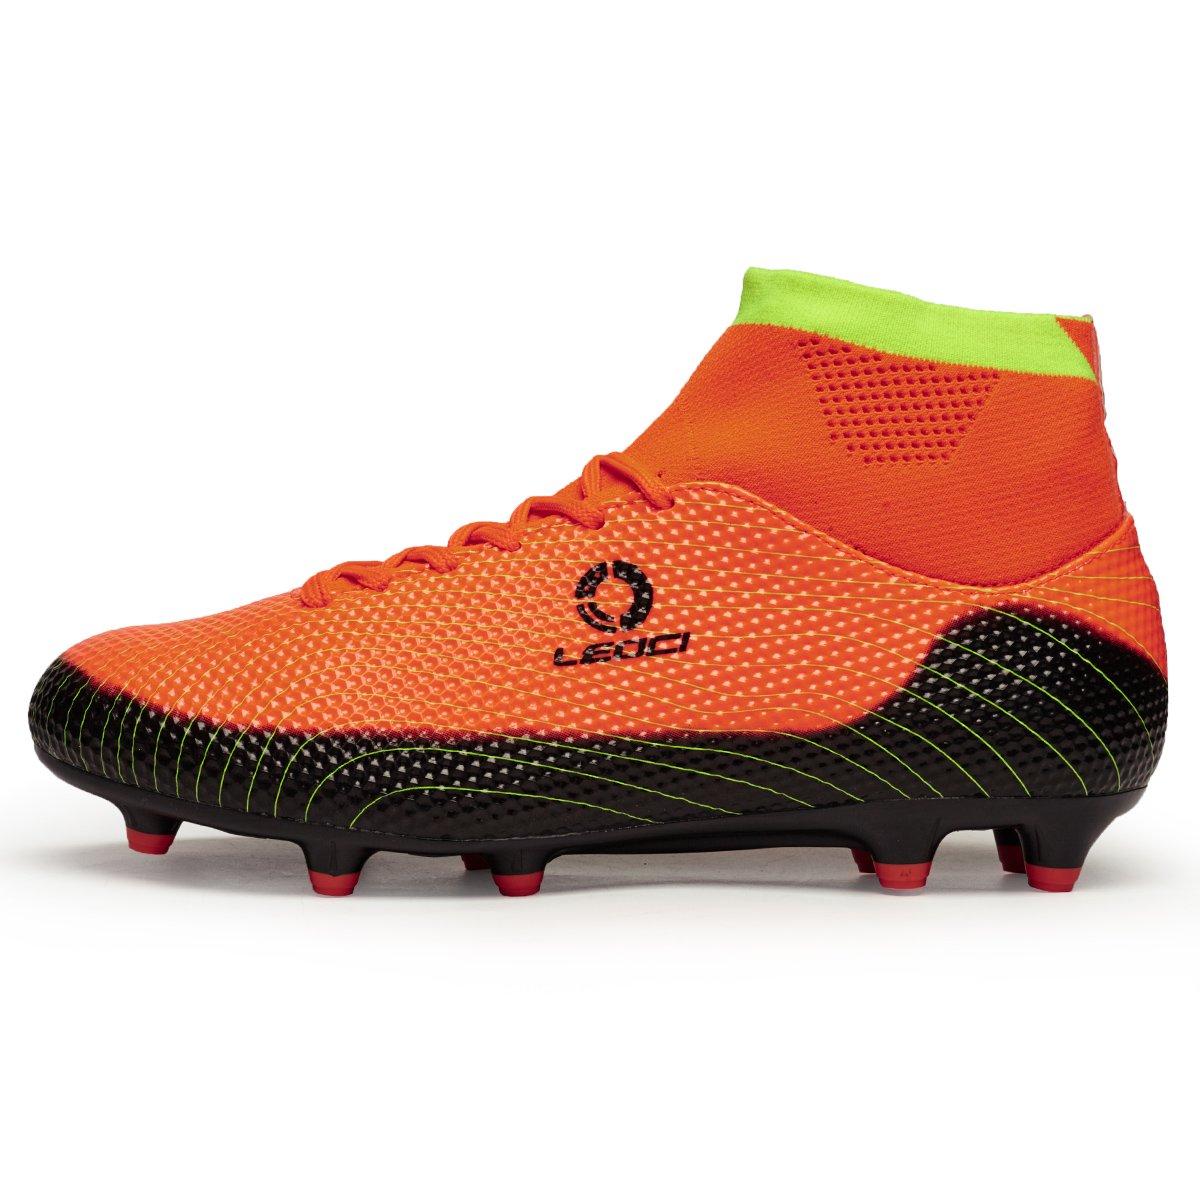 Leoci Athletic Men's Ground Soccer Football Shoe Lighting Outdoor Soccer Kid's Cleat(Little Kid Big Kid)